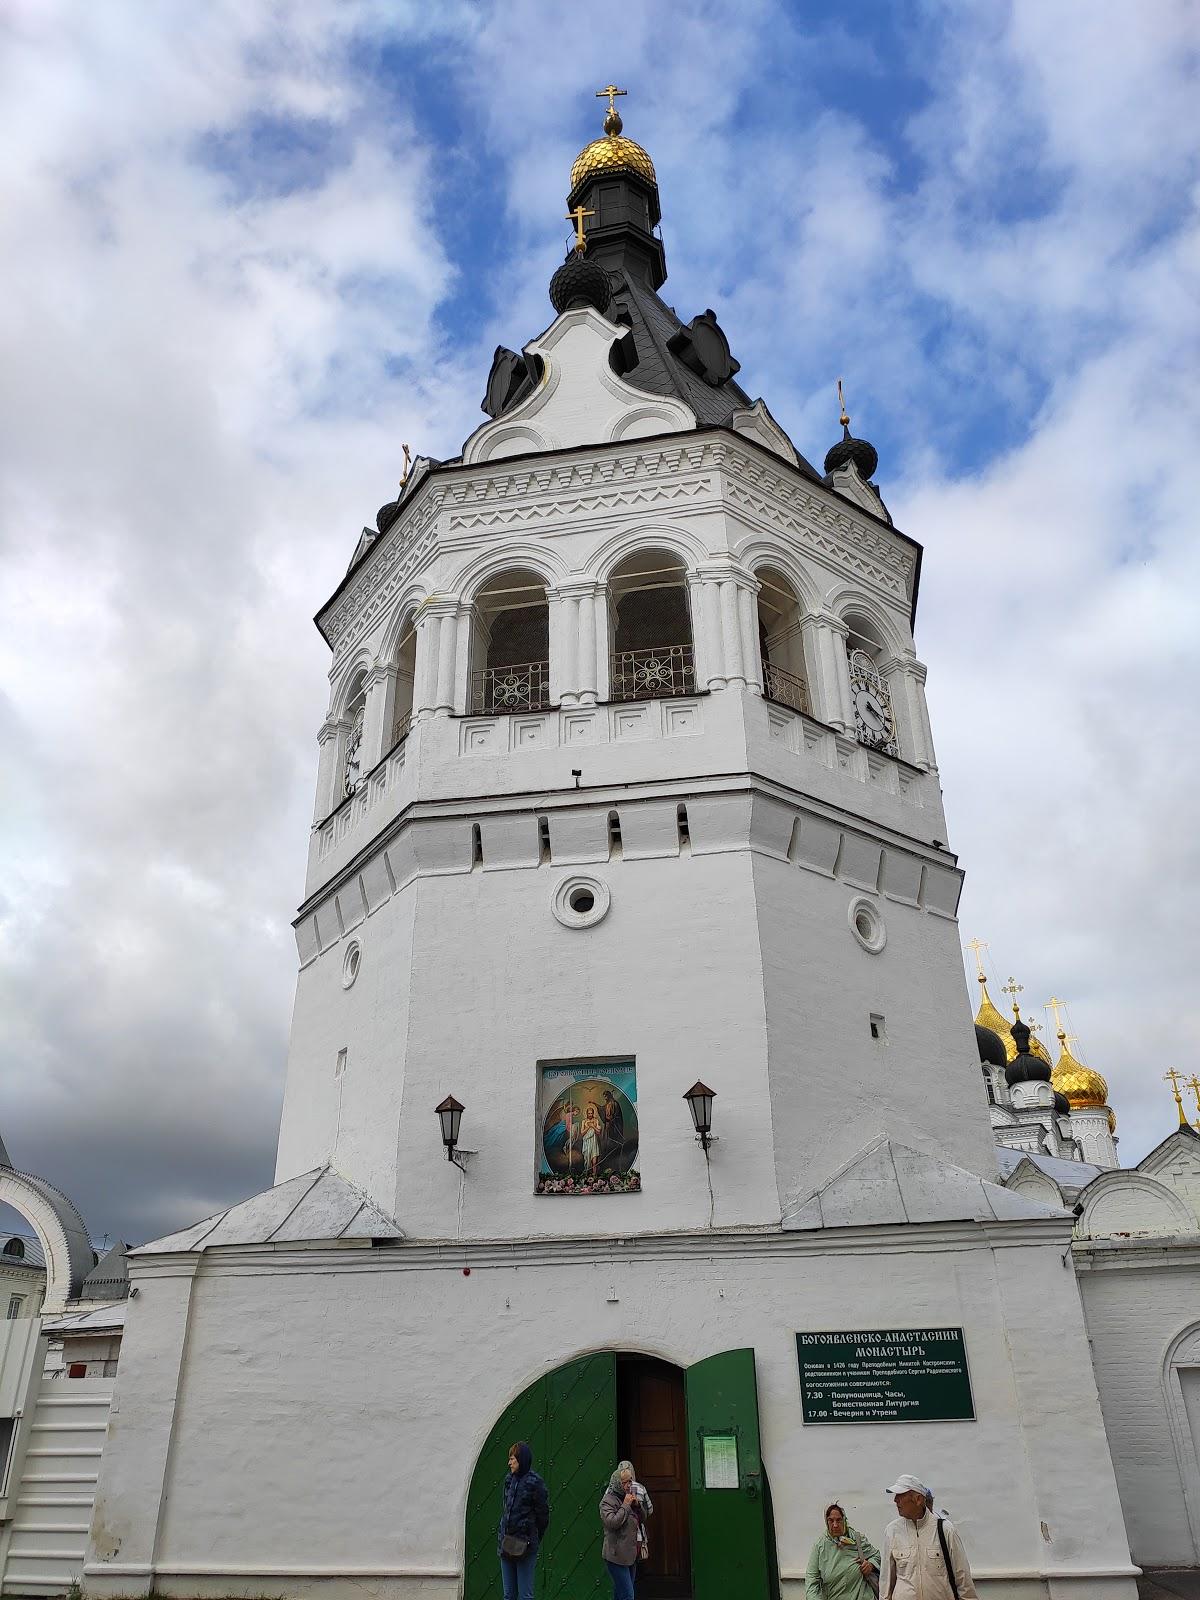 Богоявленский-Анастасиин Женский Монастырь